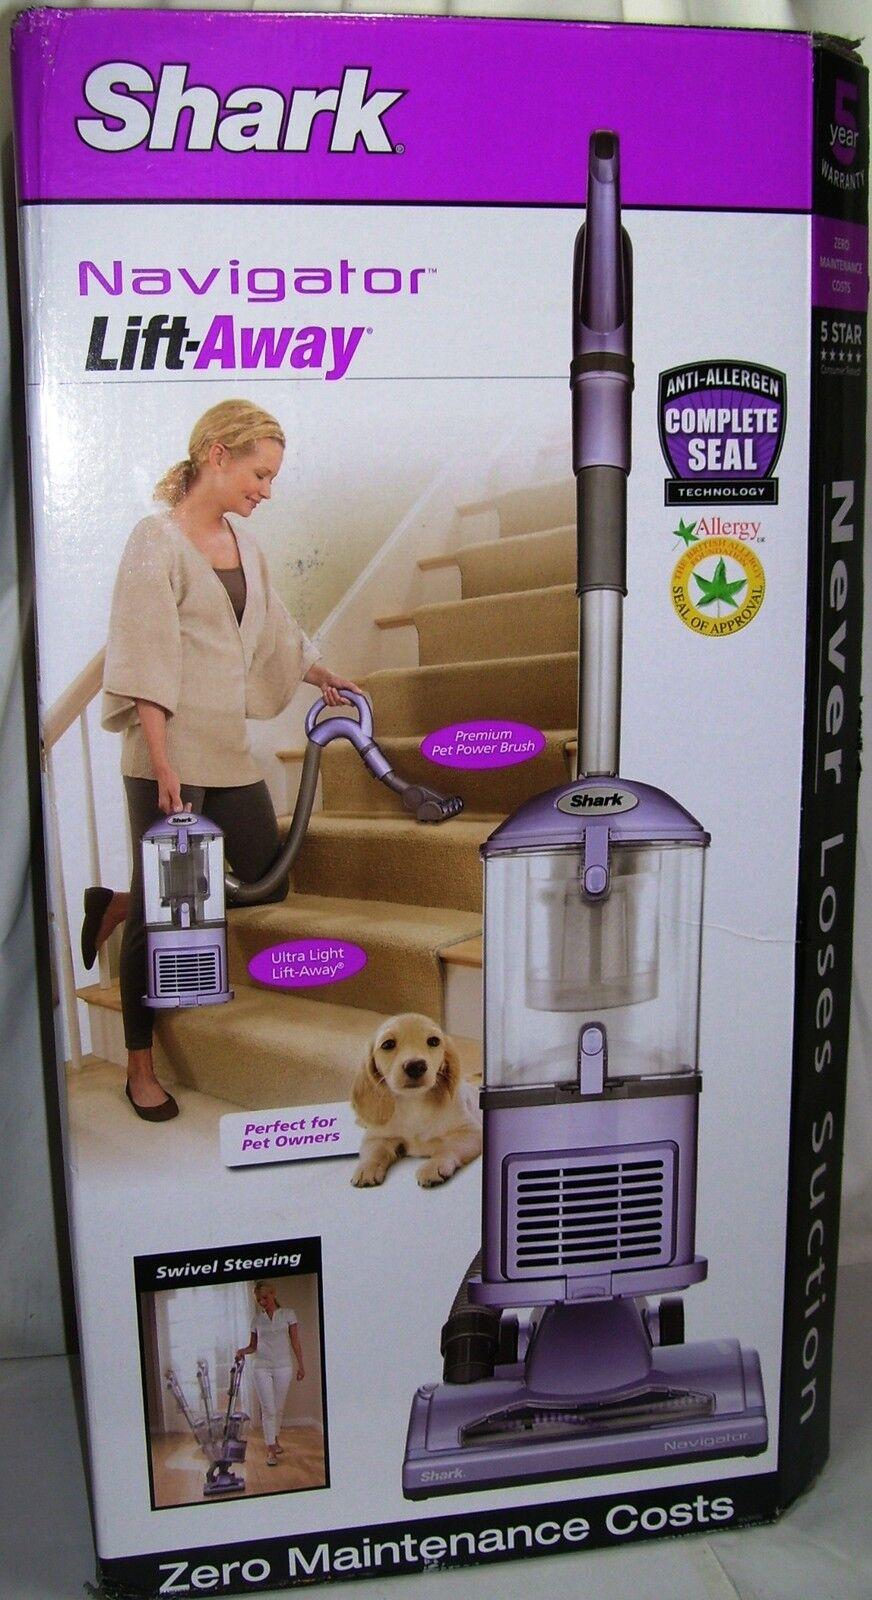 Related to Amazon.com - Shark Navigator Lift-Away Vacuum (NV352